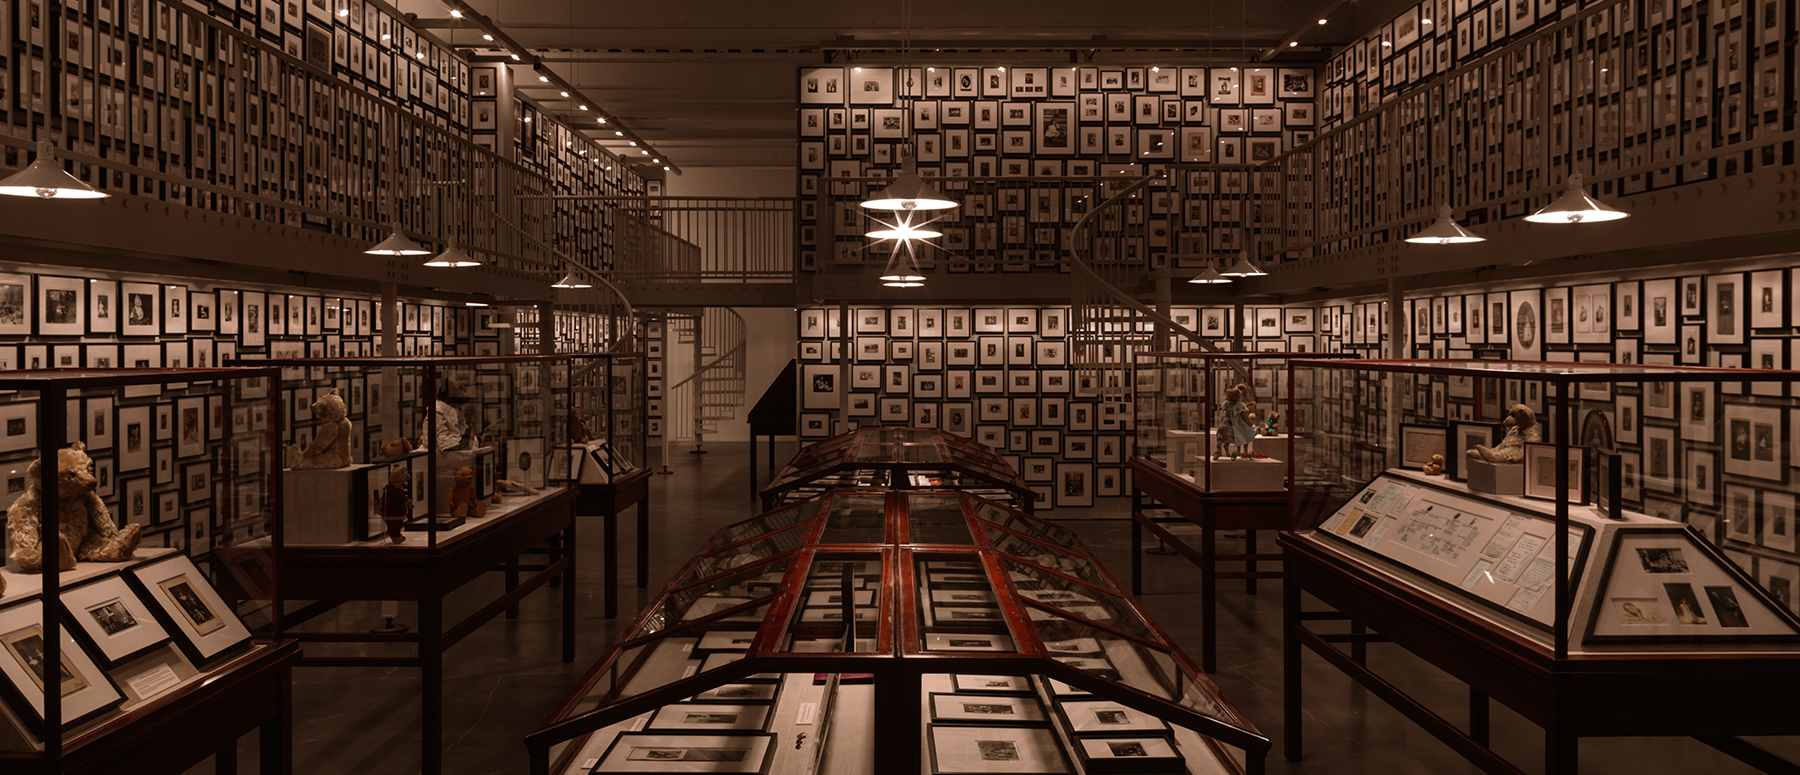 new-museum-the-keeper-ydessa-hendeles-designboom-1800